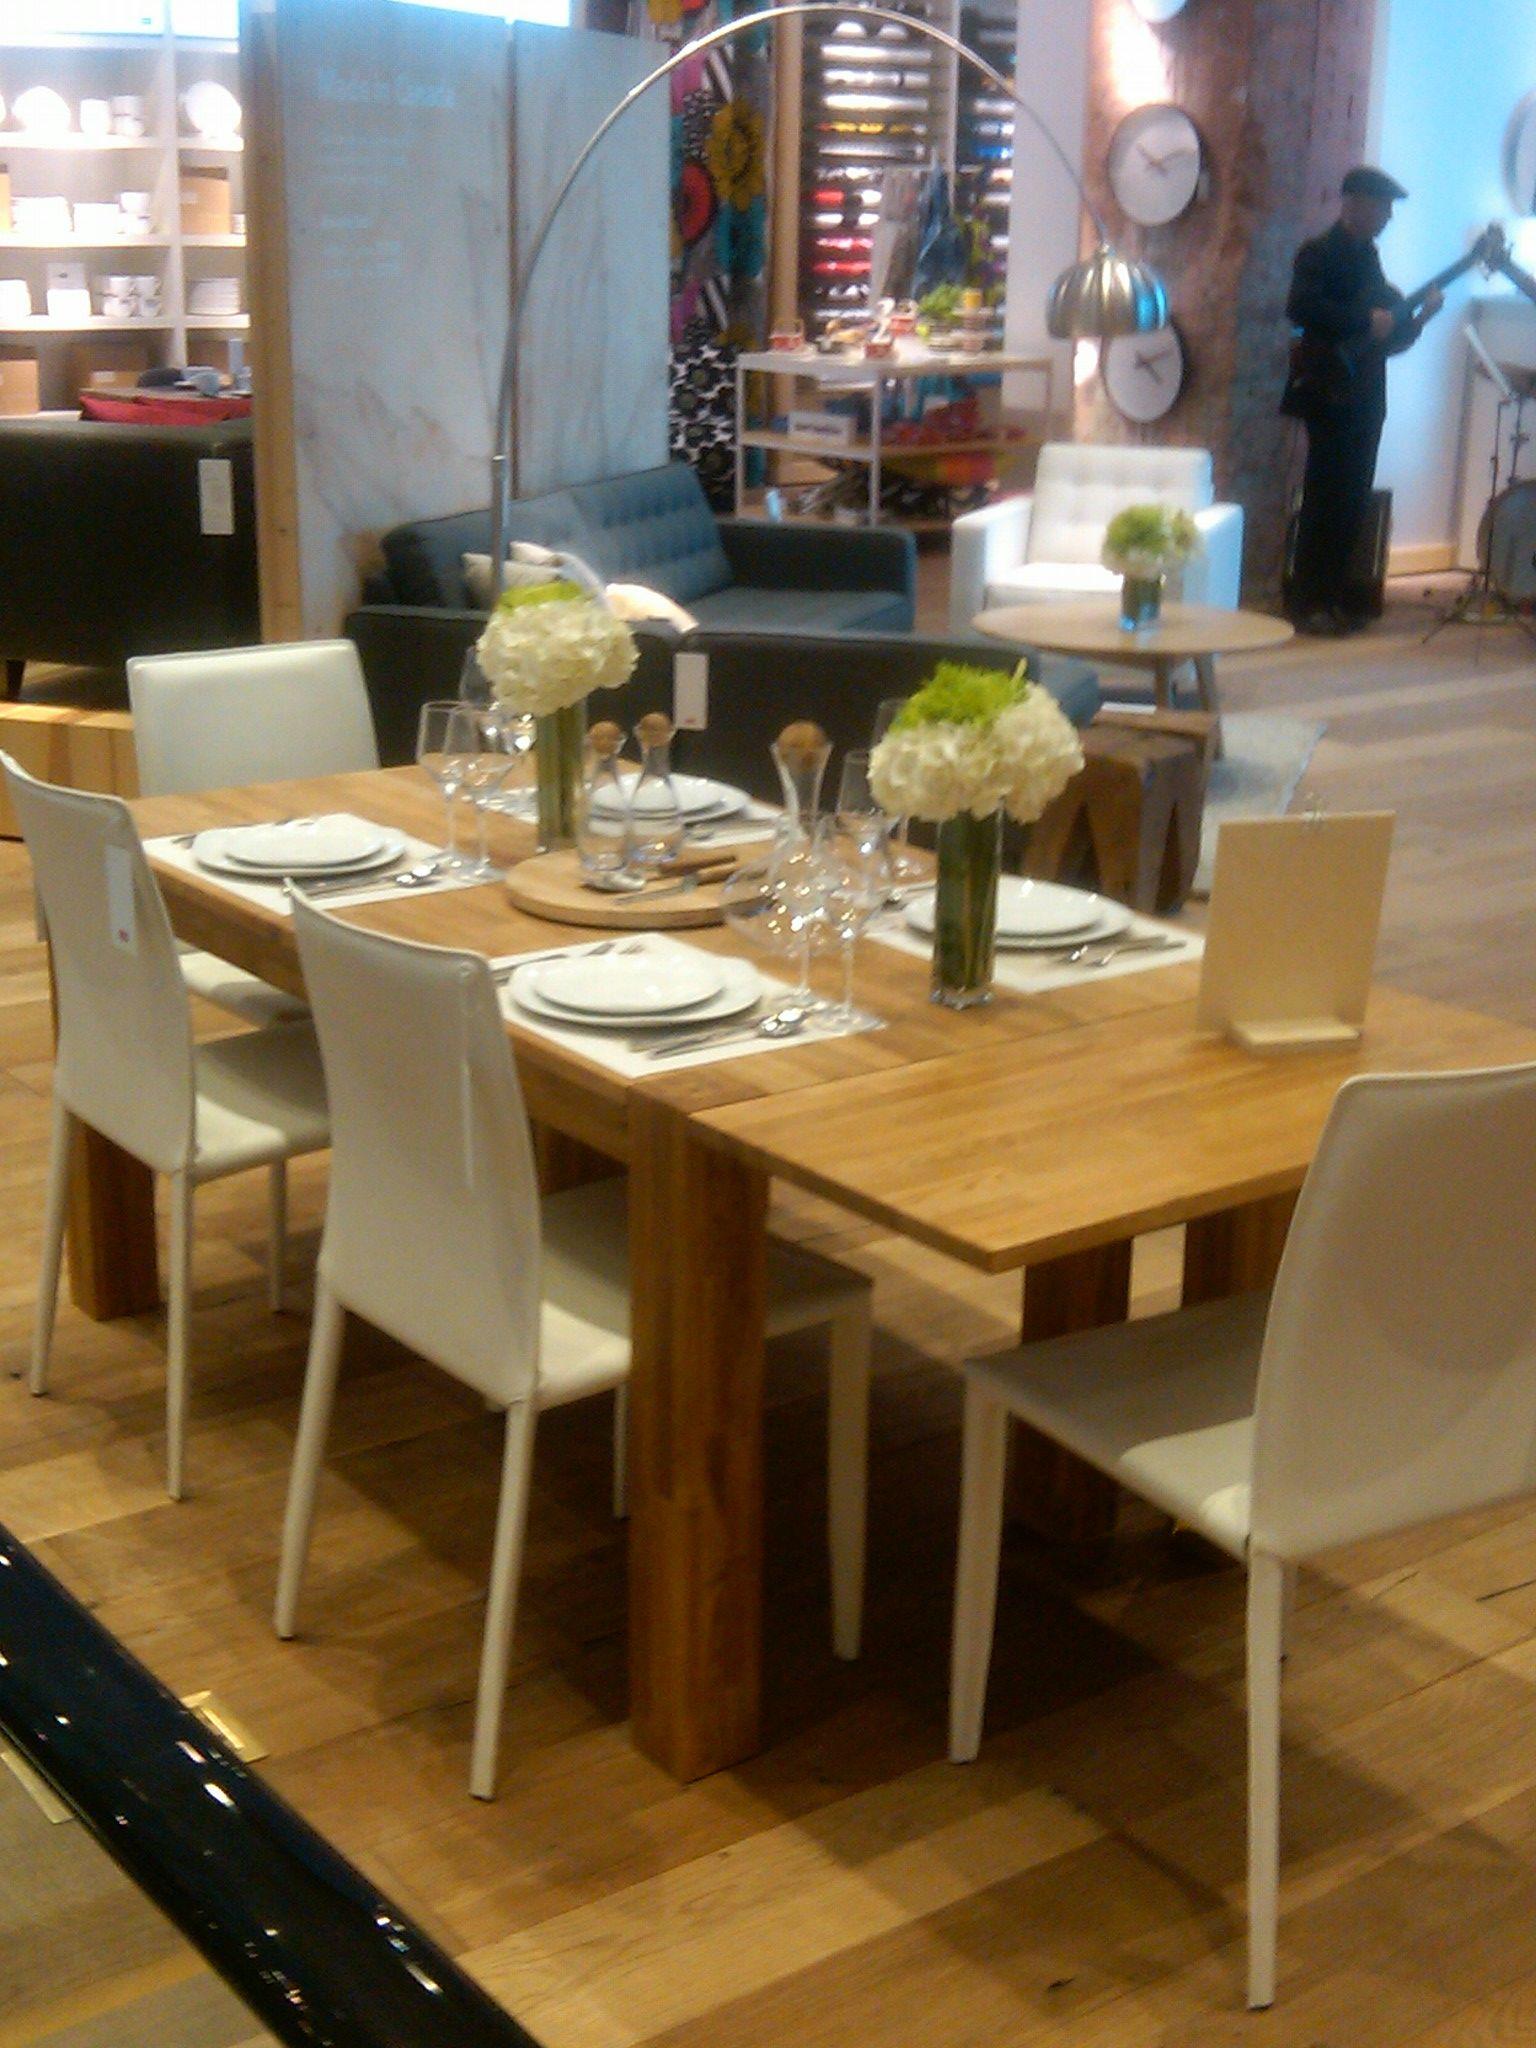 eq3 harvest table - Google Search | Home design | Pinterest ...